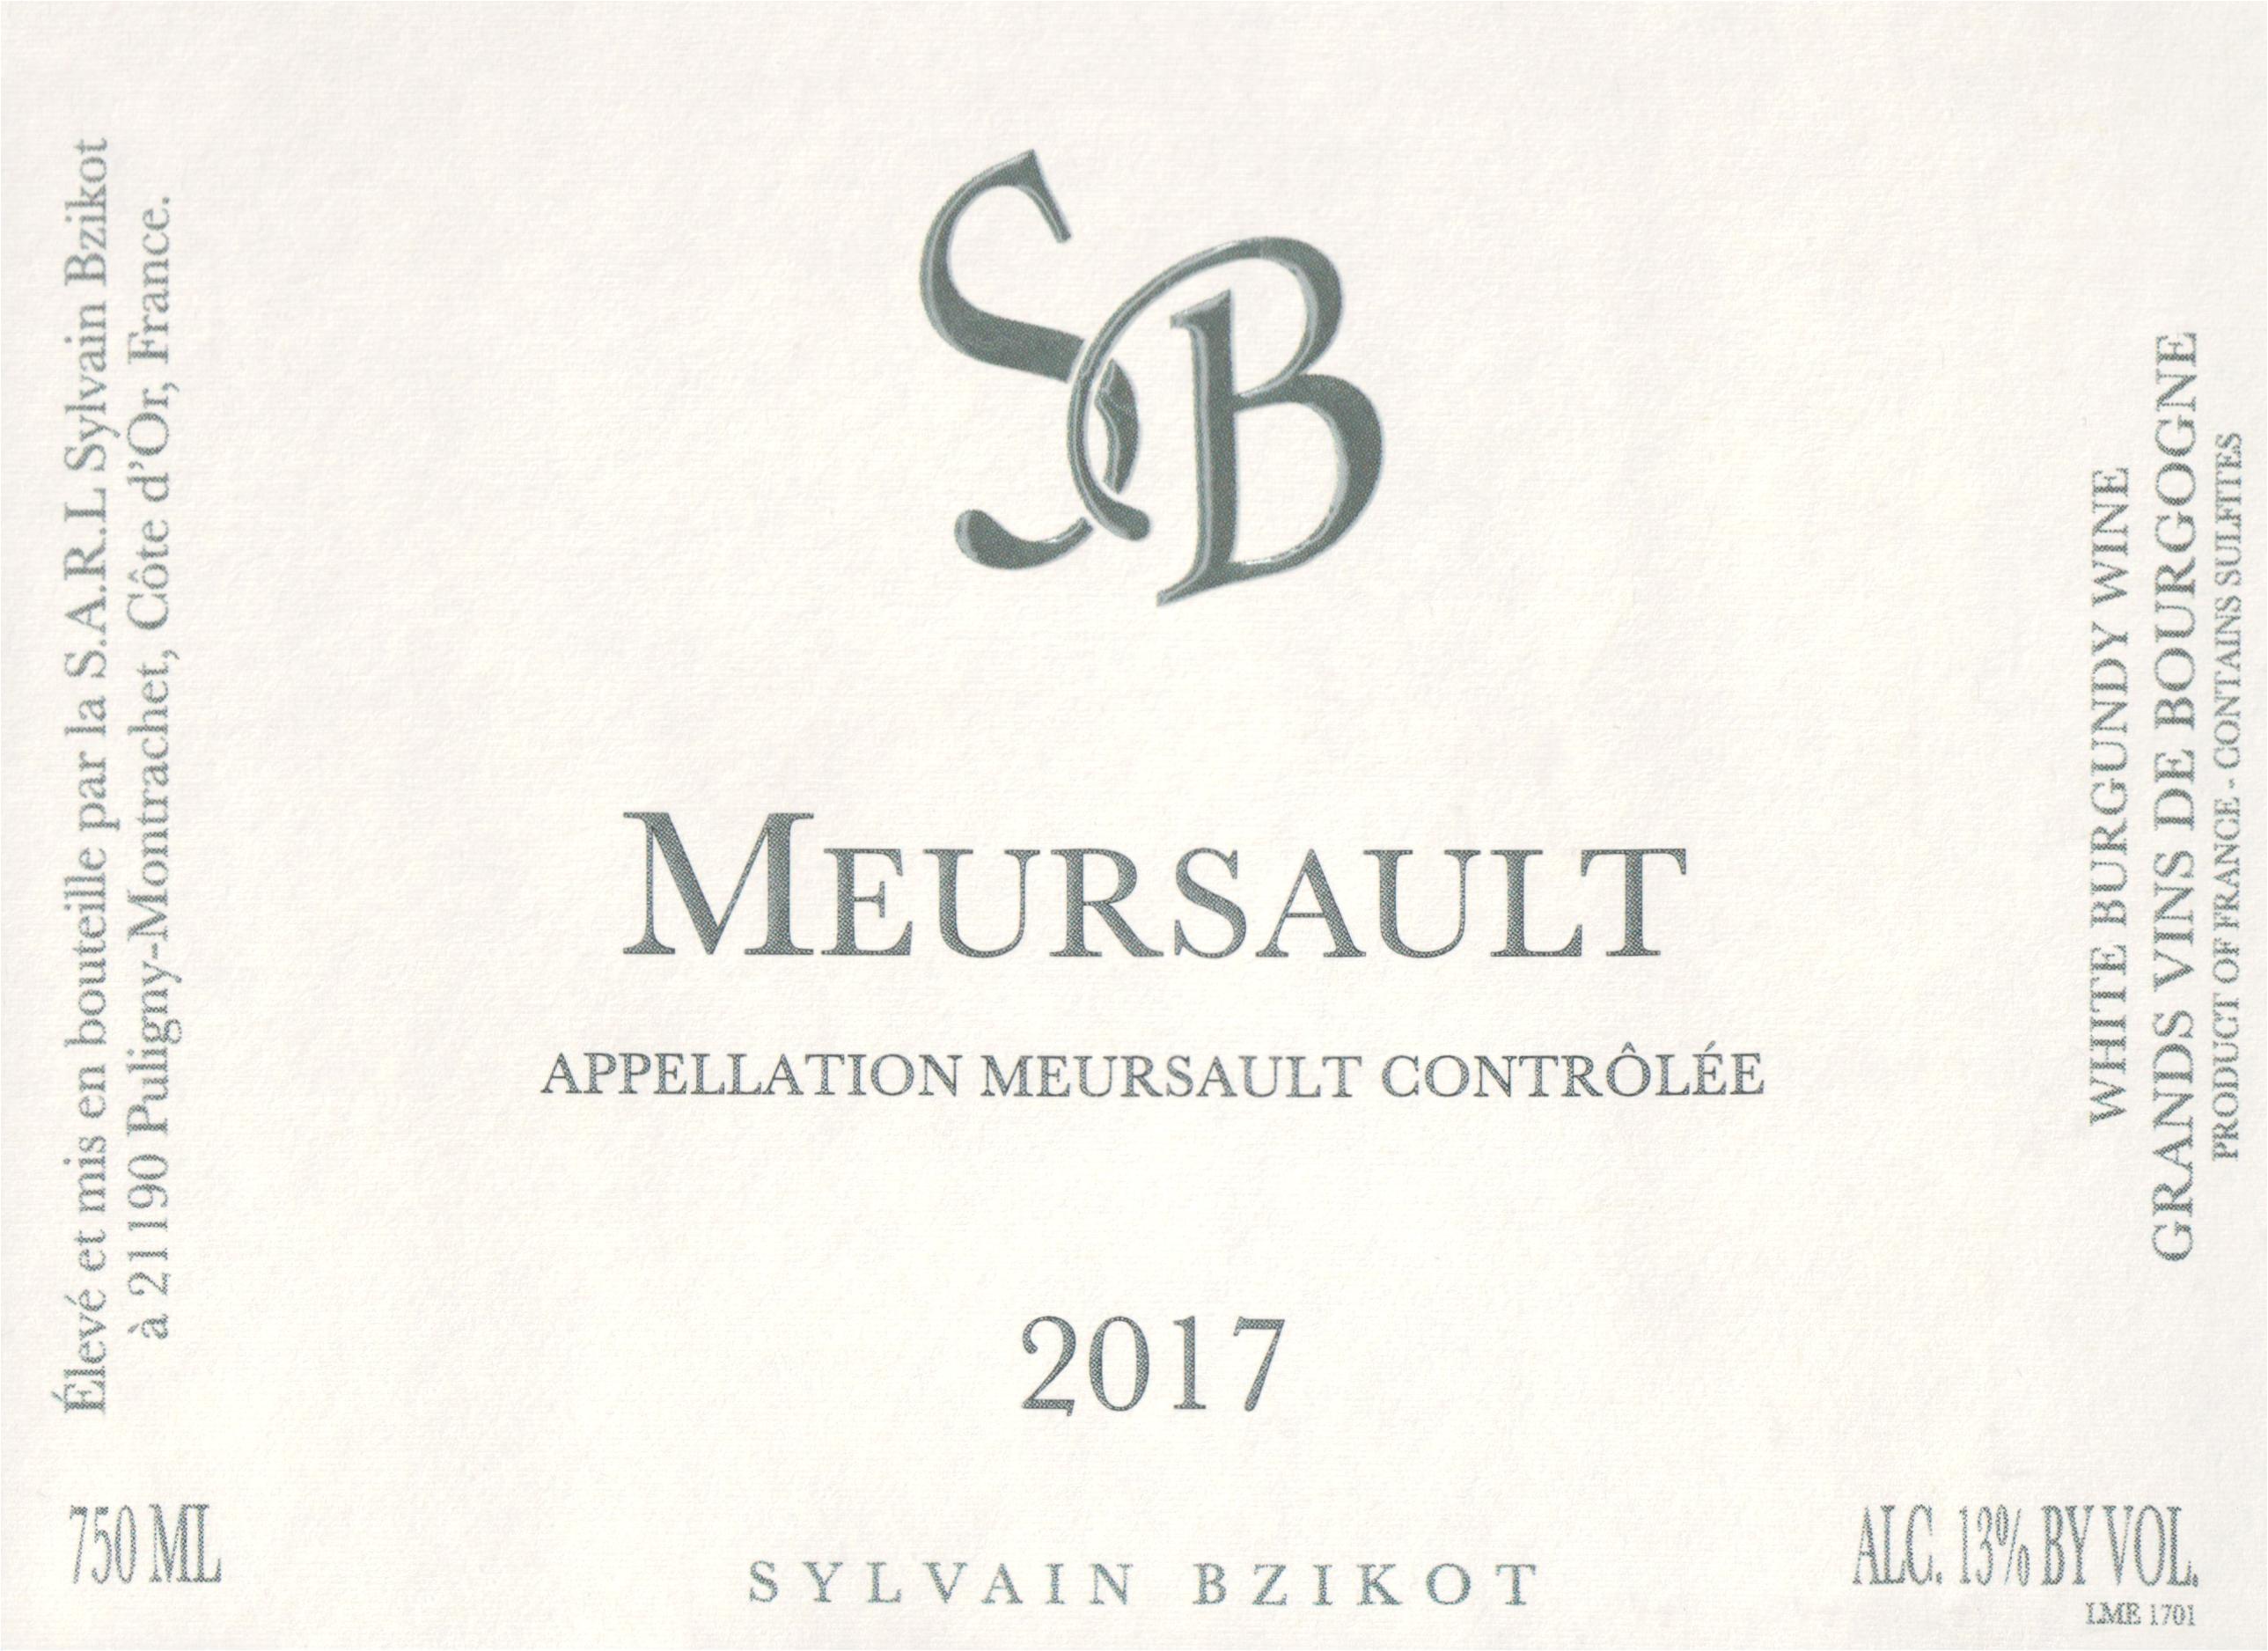 Sylvain Bzikot Meursault 2017